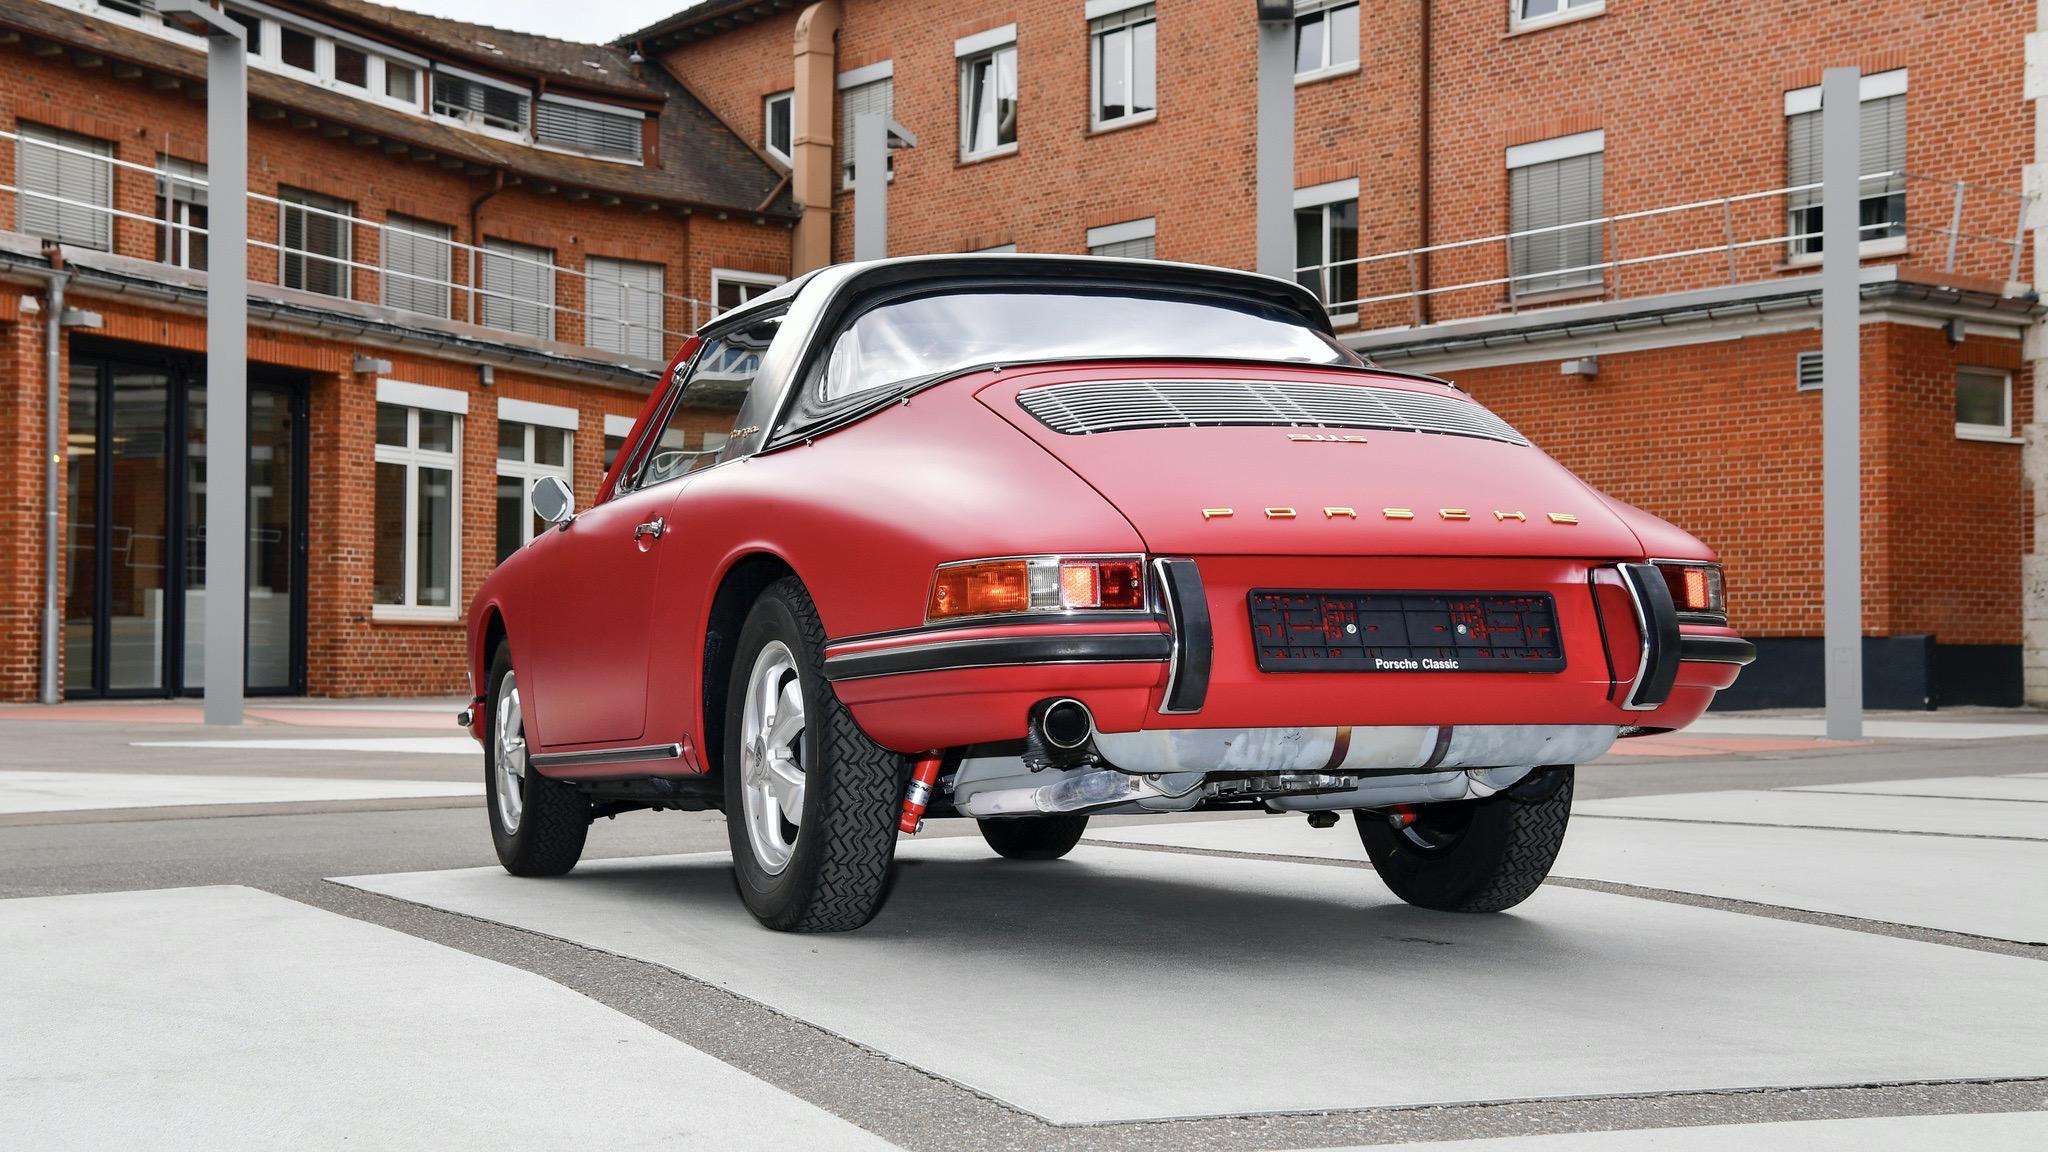 Porsche Classic 911 restoration 24